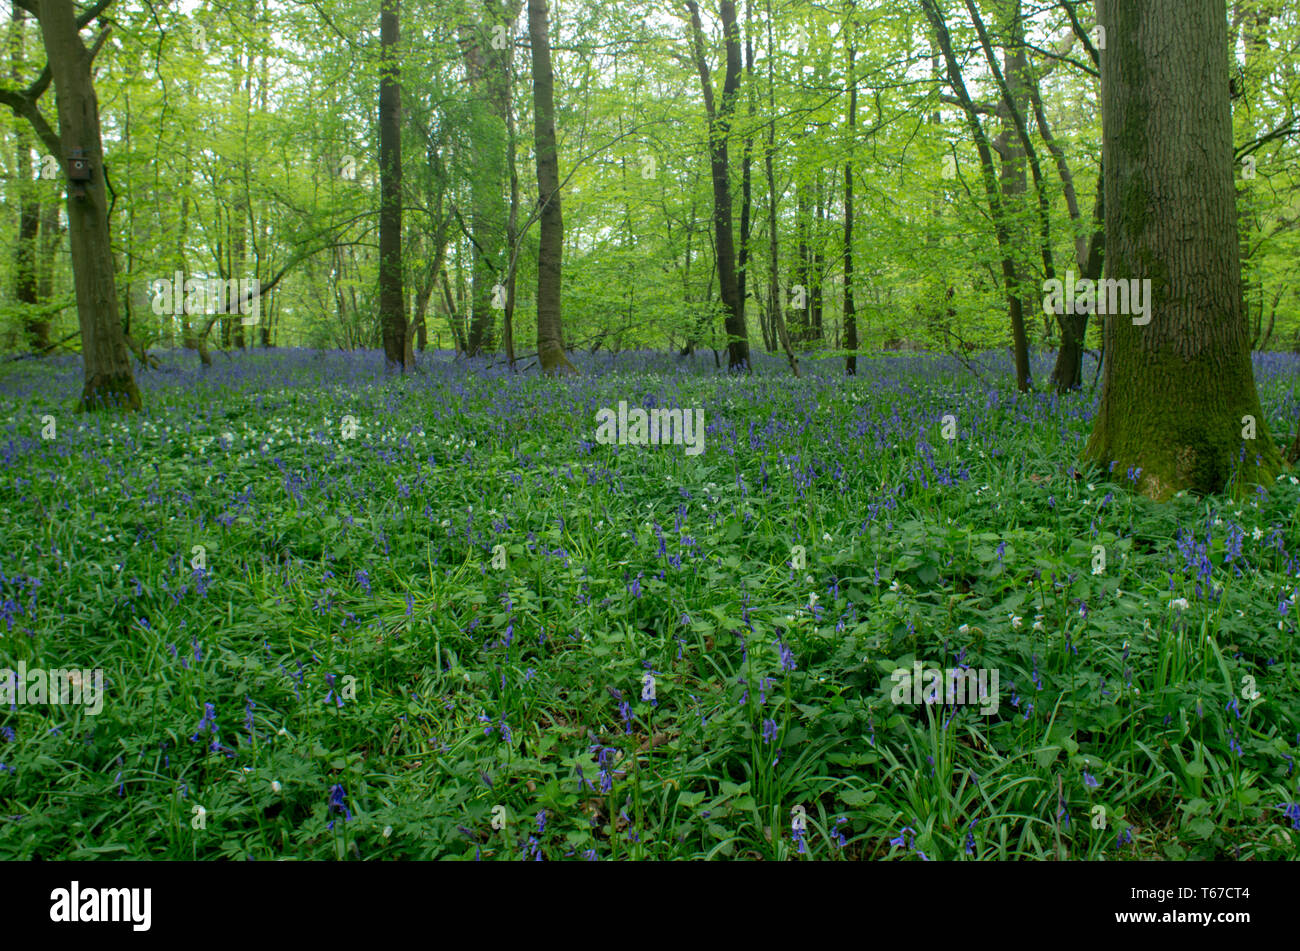 Bluebells (hyancithoid) carpet the floor of Poulton Wood, Kent - Stock Image